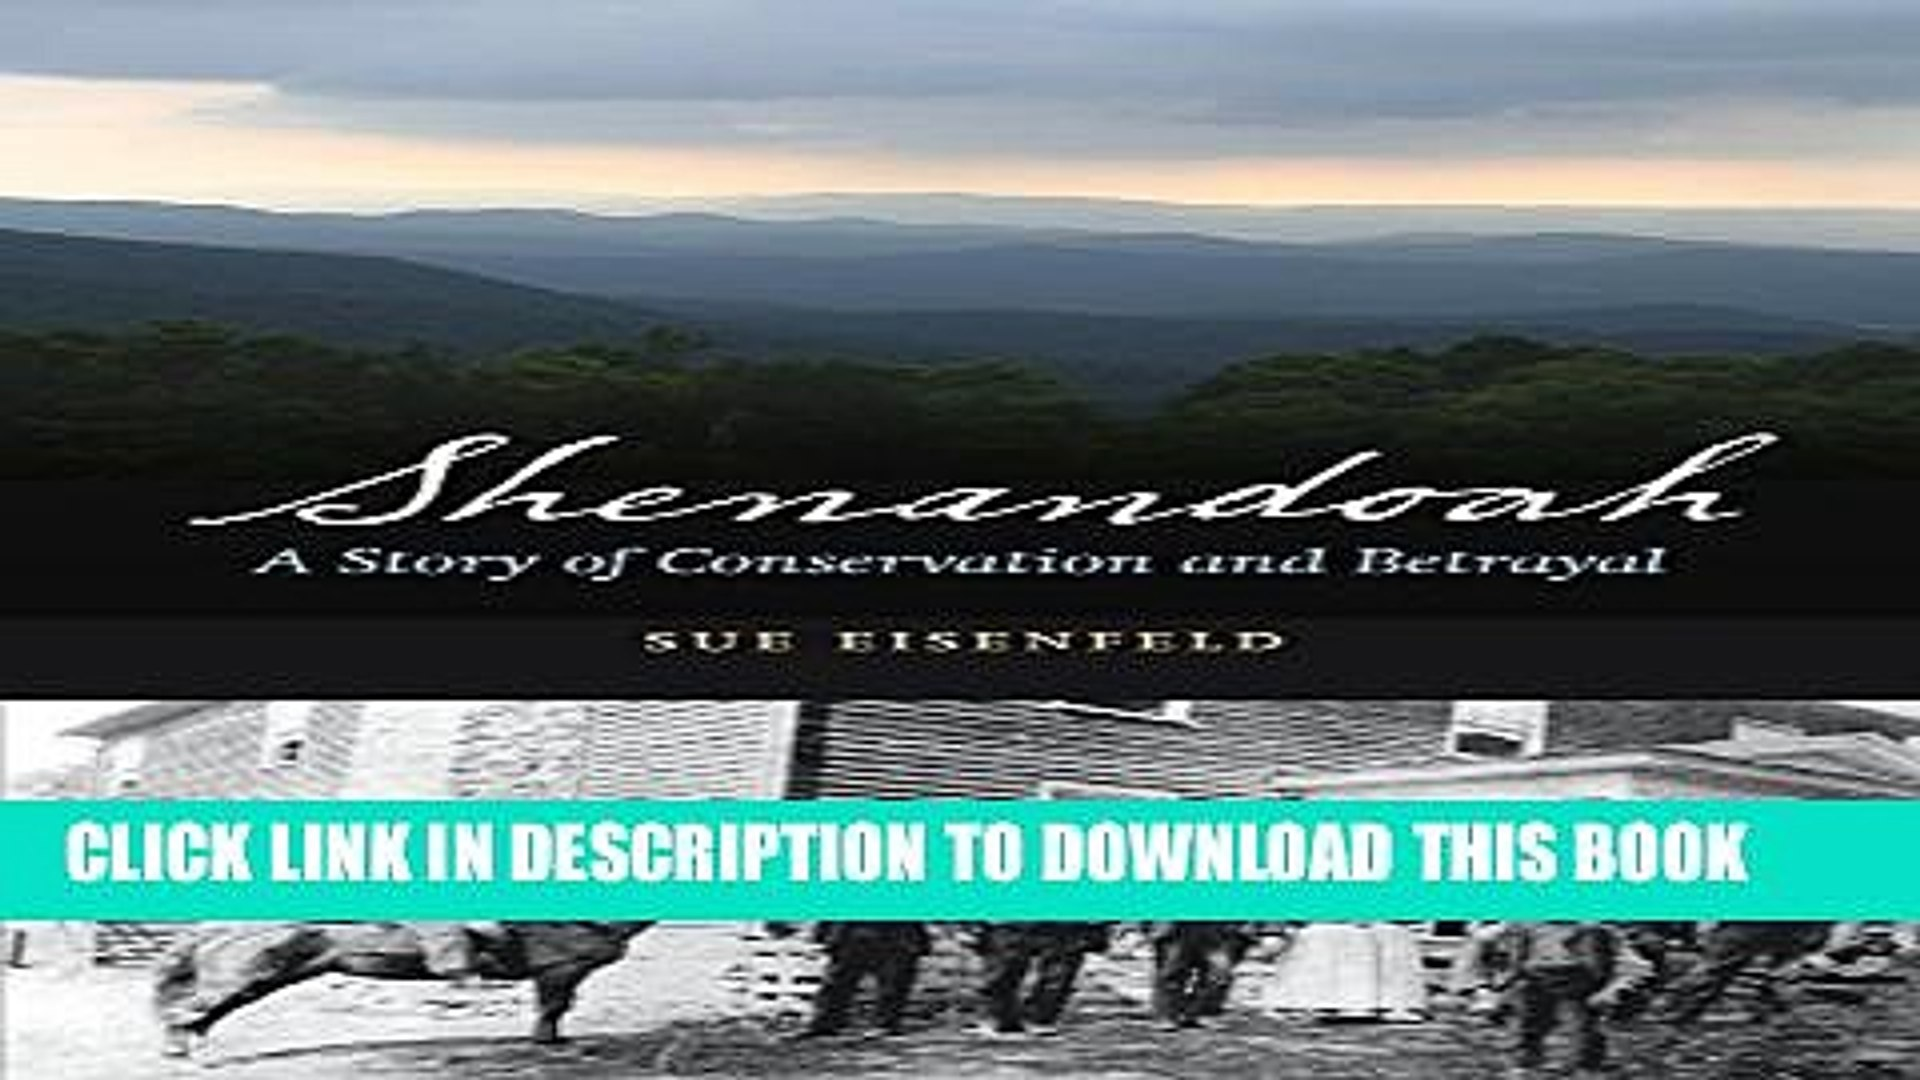 [PDF] Shenandoah: A Story of Conservation and Betrayal Popular Online[PDF] Shenandoah: A Story of